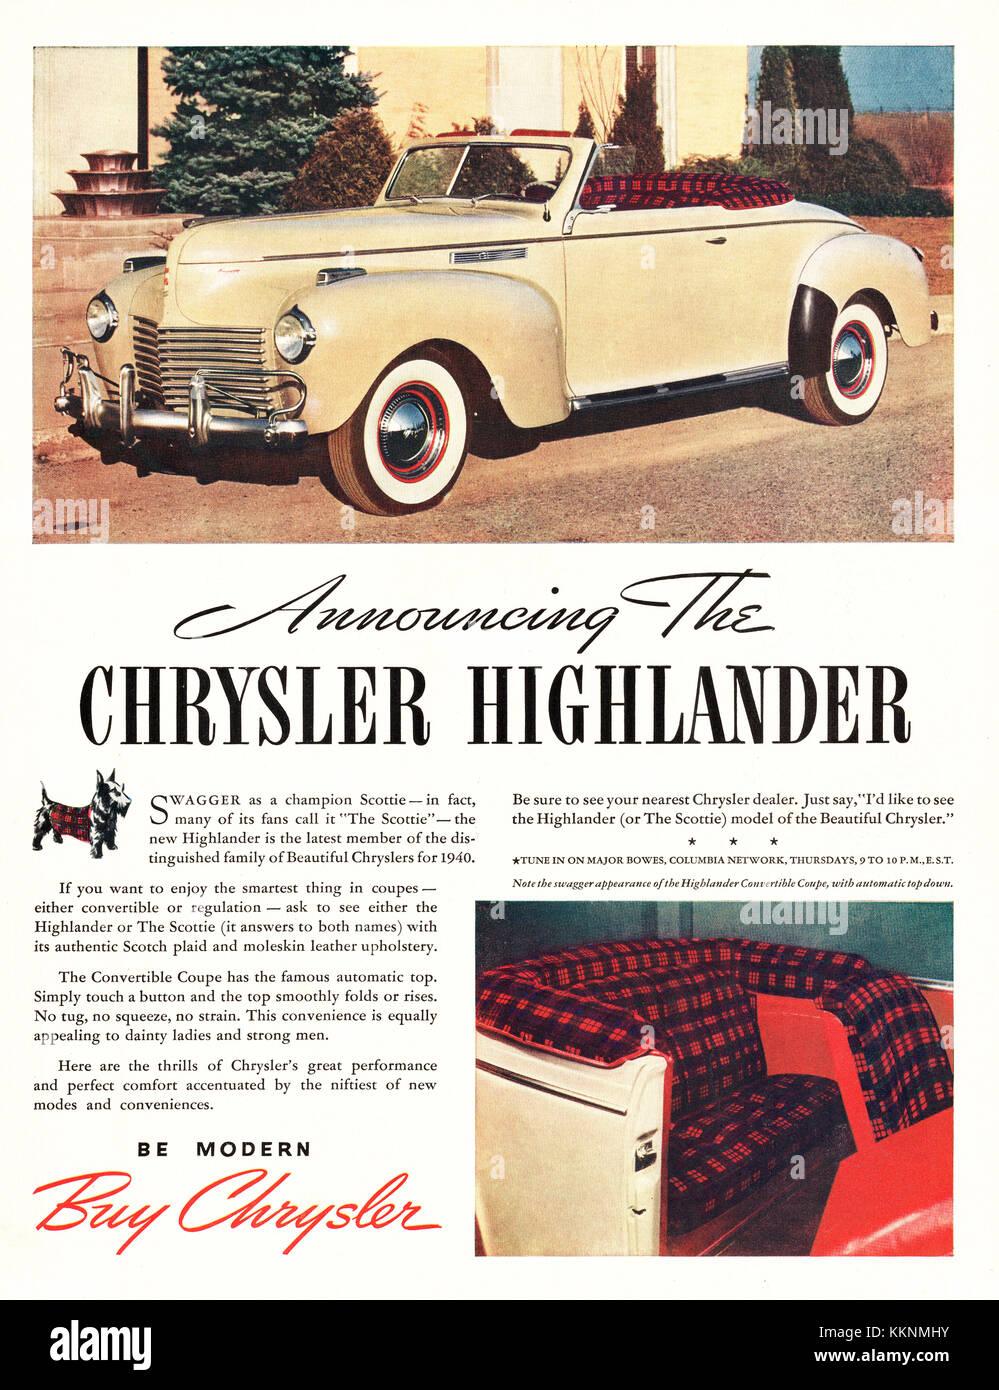 US Magazine Chrysler Highlander Advert Stock Photo Royalty - The nearest chrysler dealership